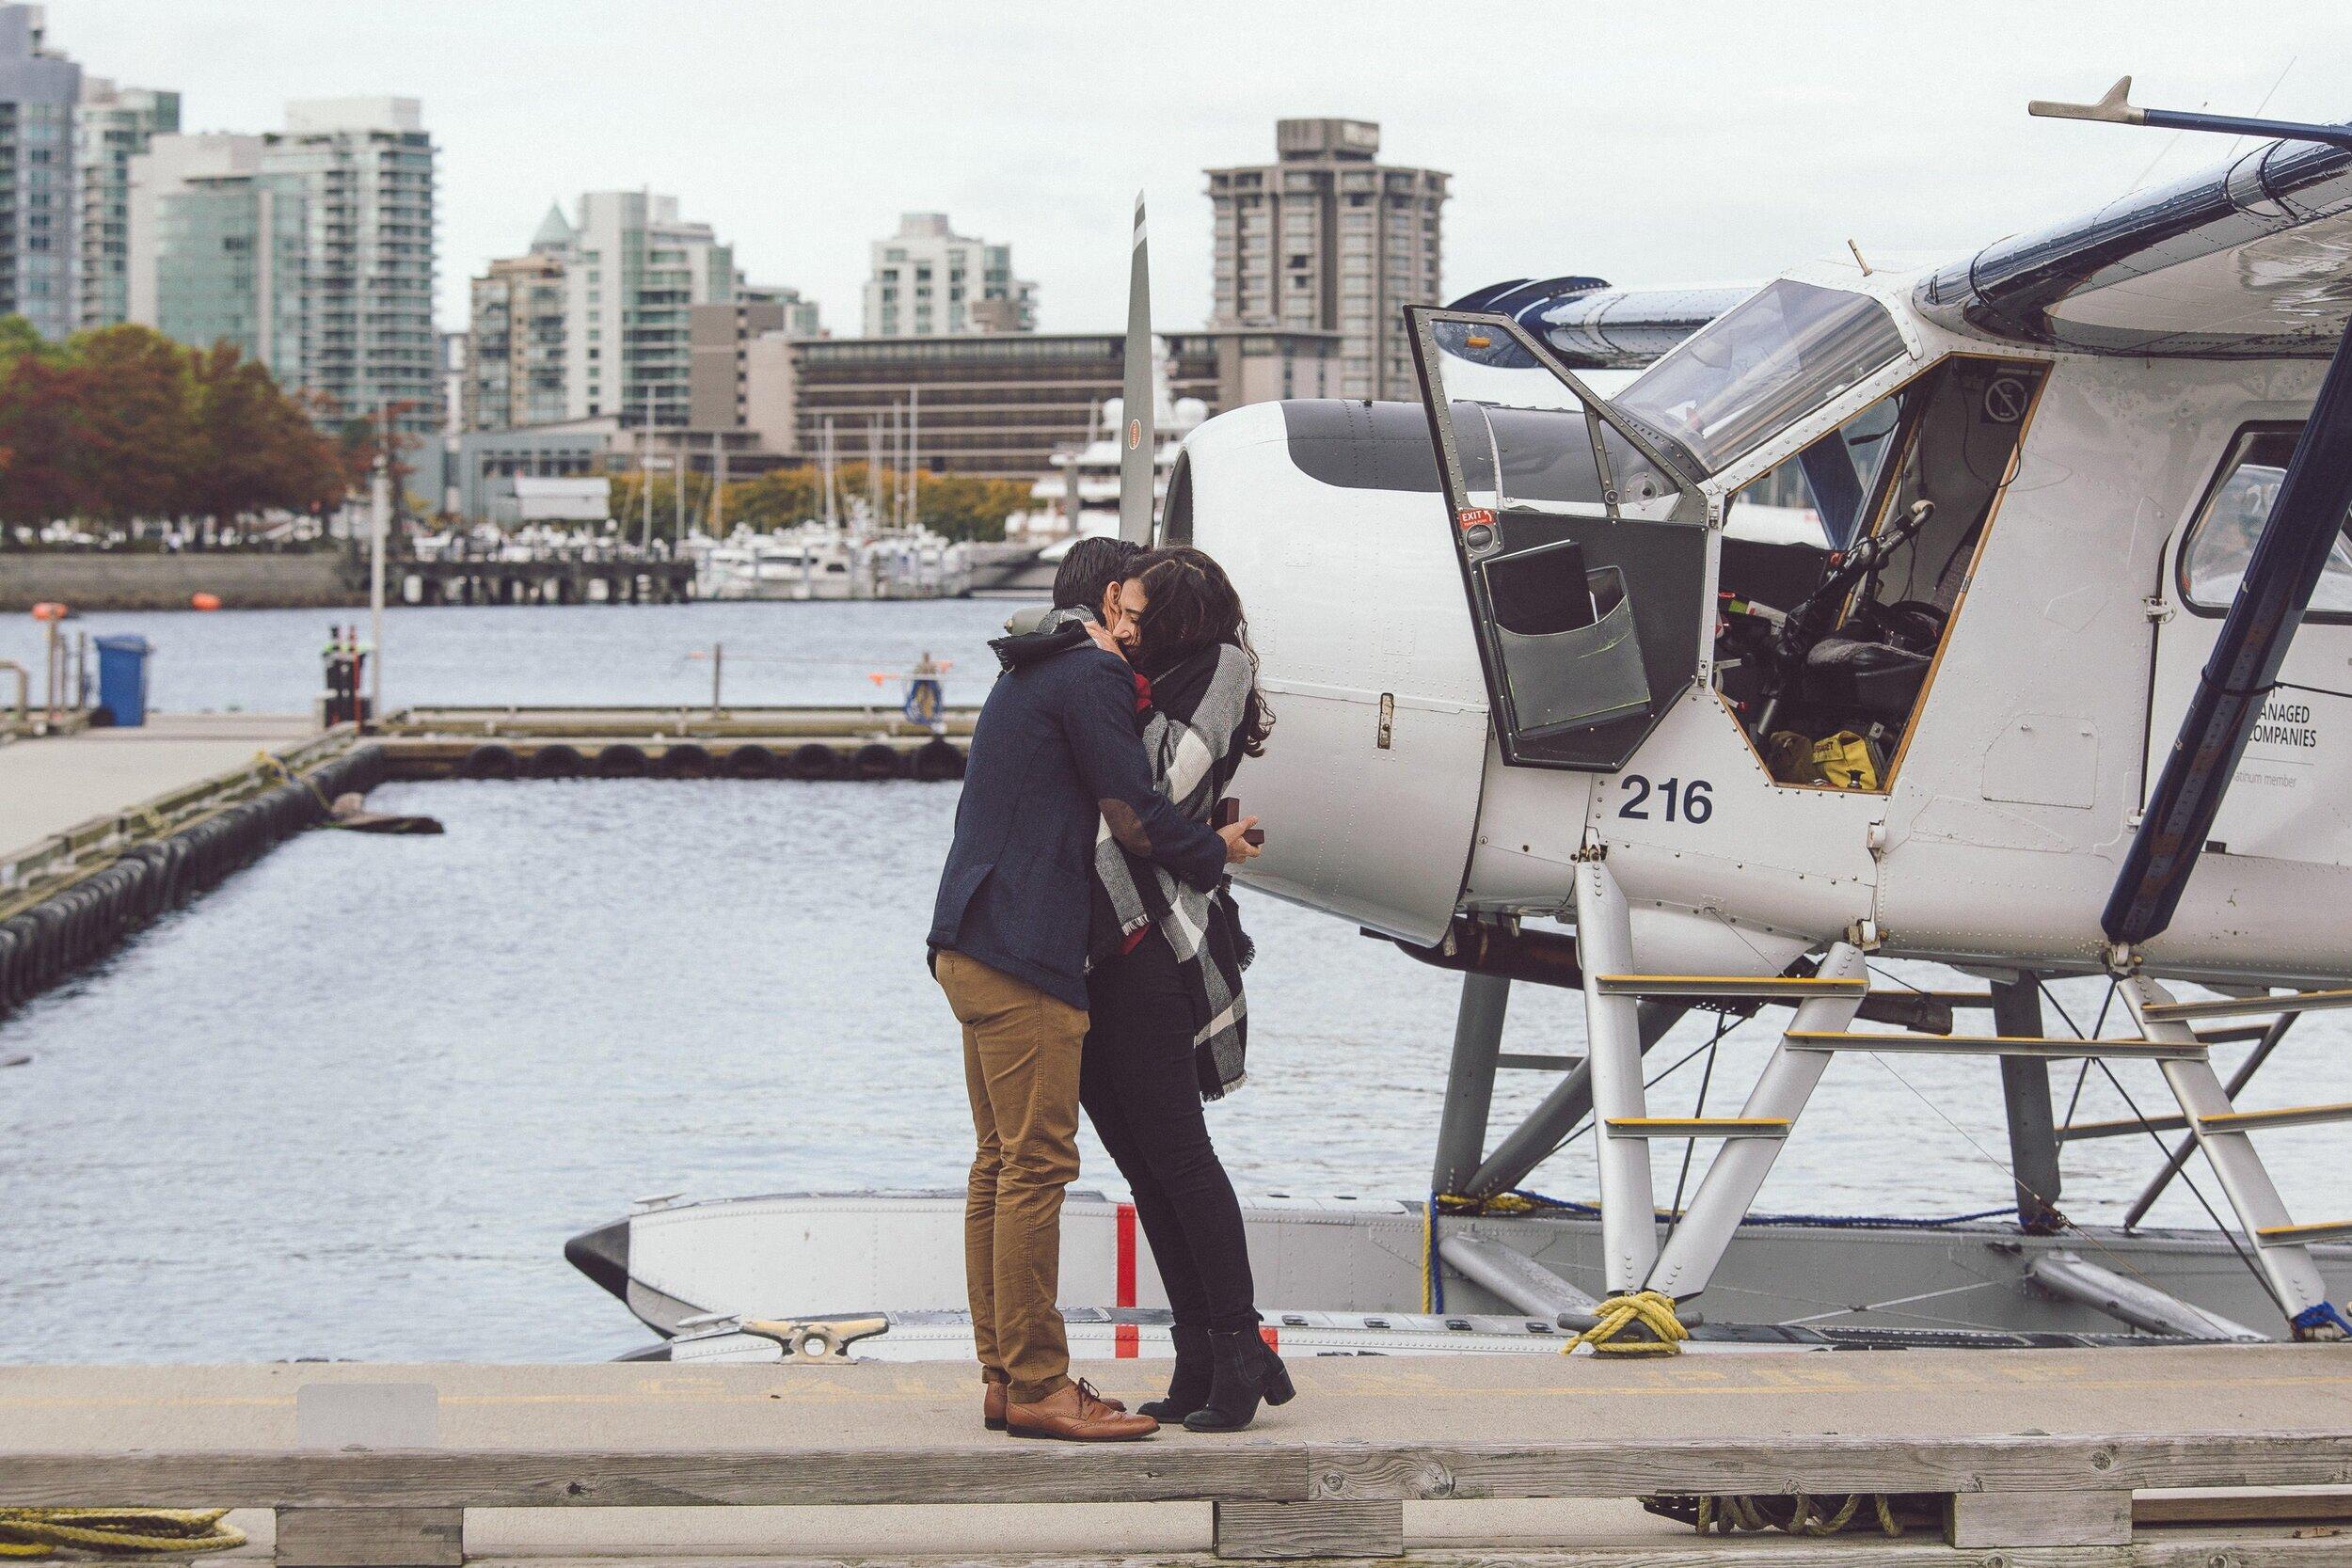 Surprise Proposal - Rafael + Andrea's Engagement at HarbourAir Vancouver